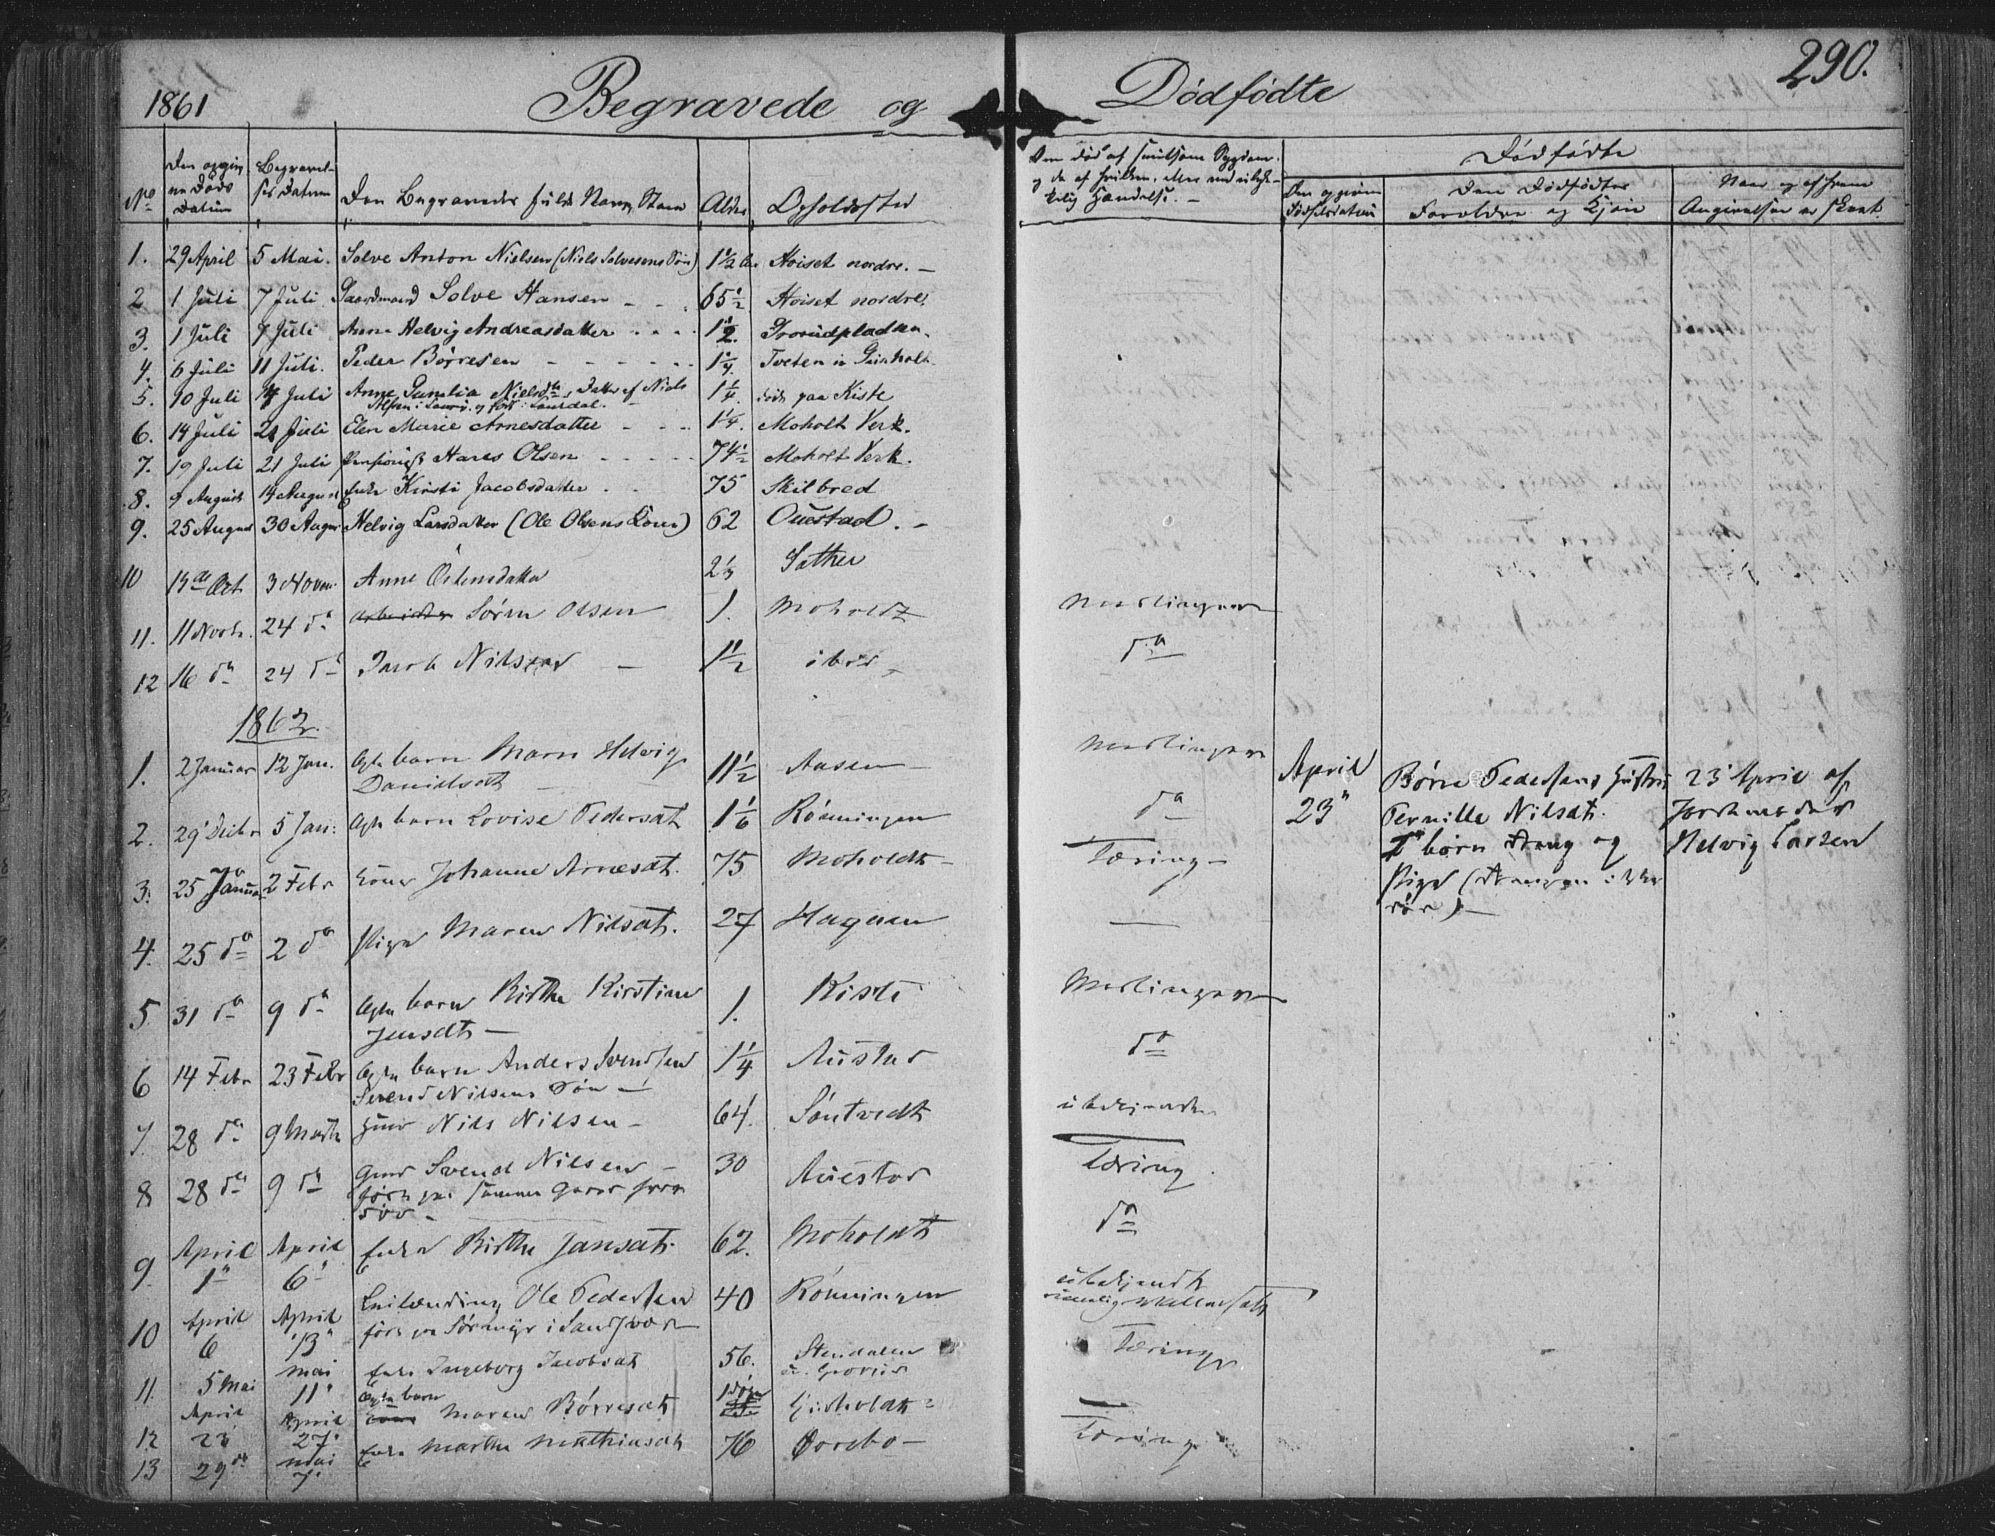 SAKO, Siljan kirkebøker, F/Fa/L0001: Parish register (official) no. 1, 1831-1870, p. 290